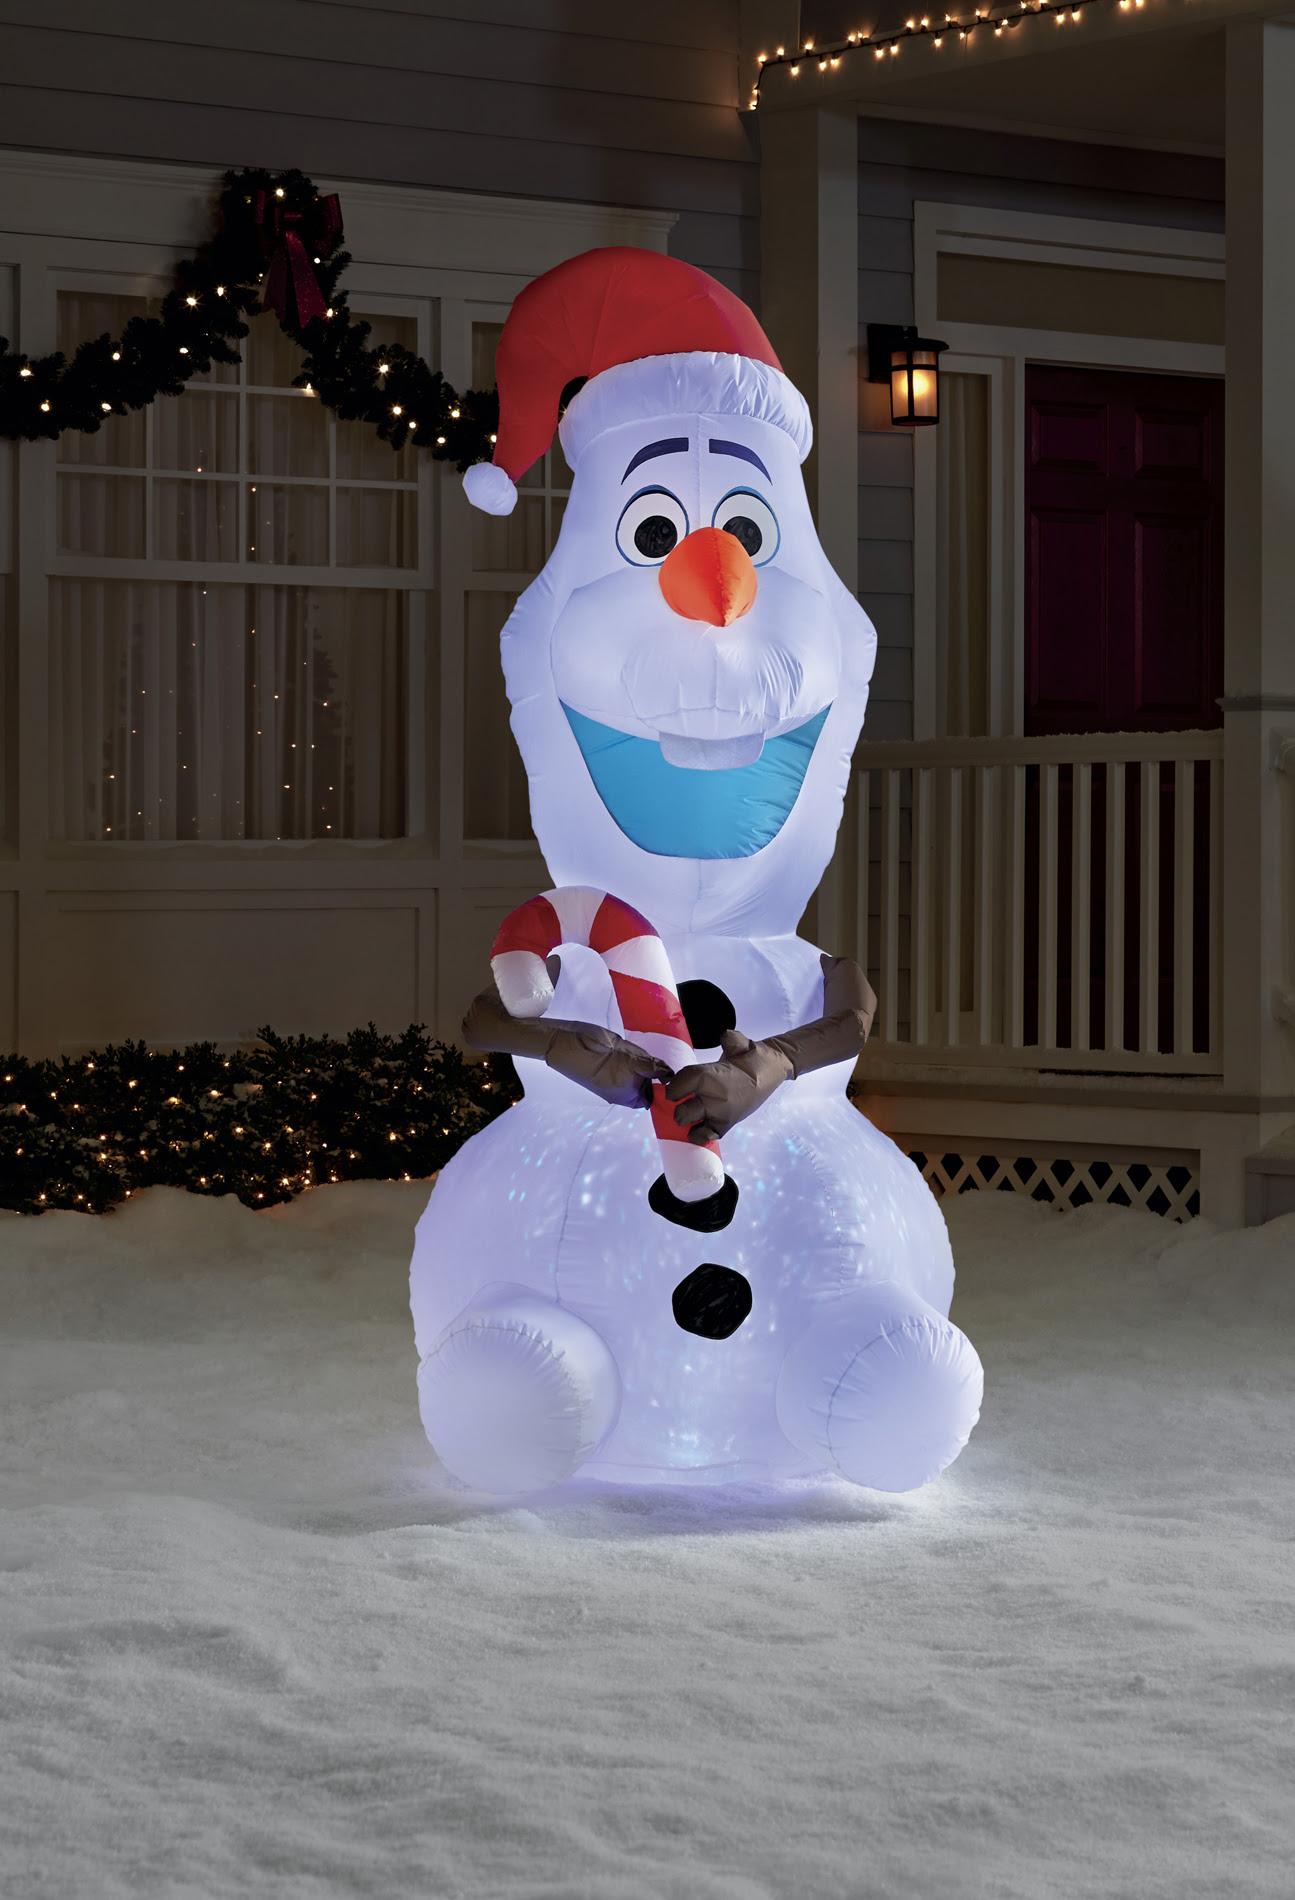 Olaf Christmas Decoration Outside - Halloween Costume Ideas